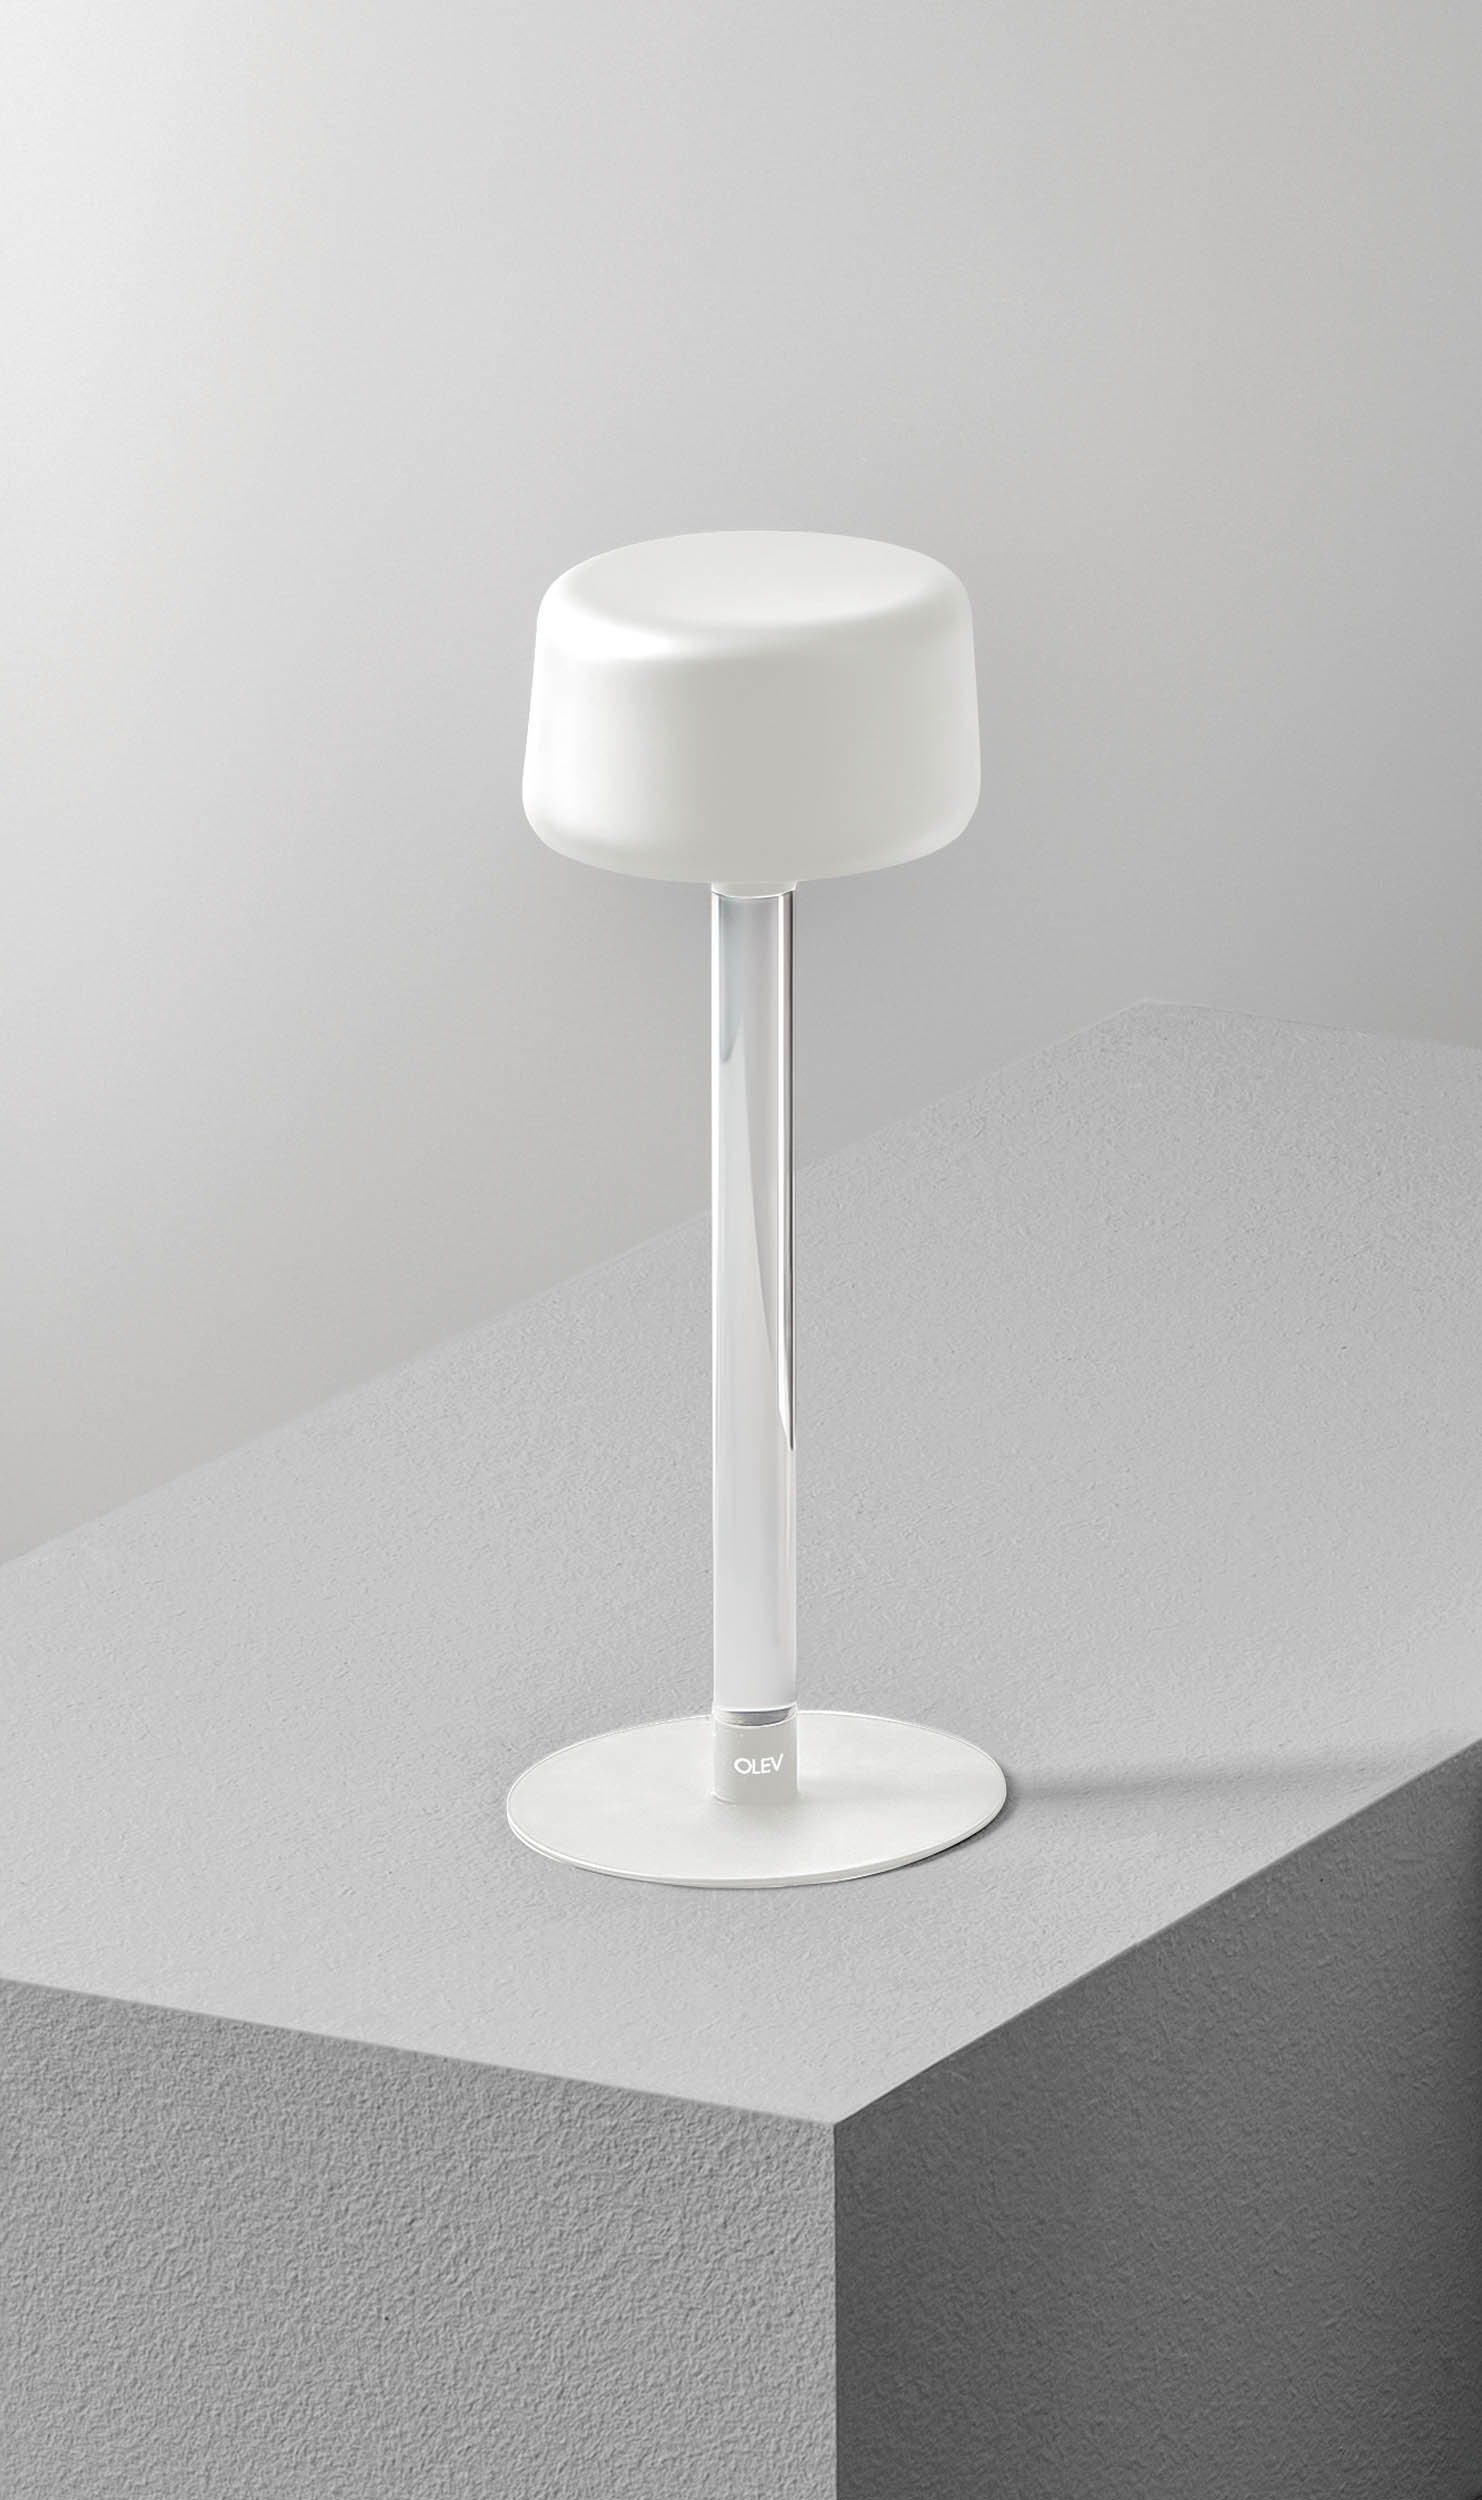 OLEV_TEE_bianca_lampada_batteria_tavolo_wireless_senza_fili_magnetica